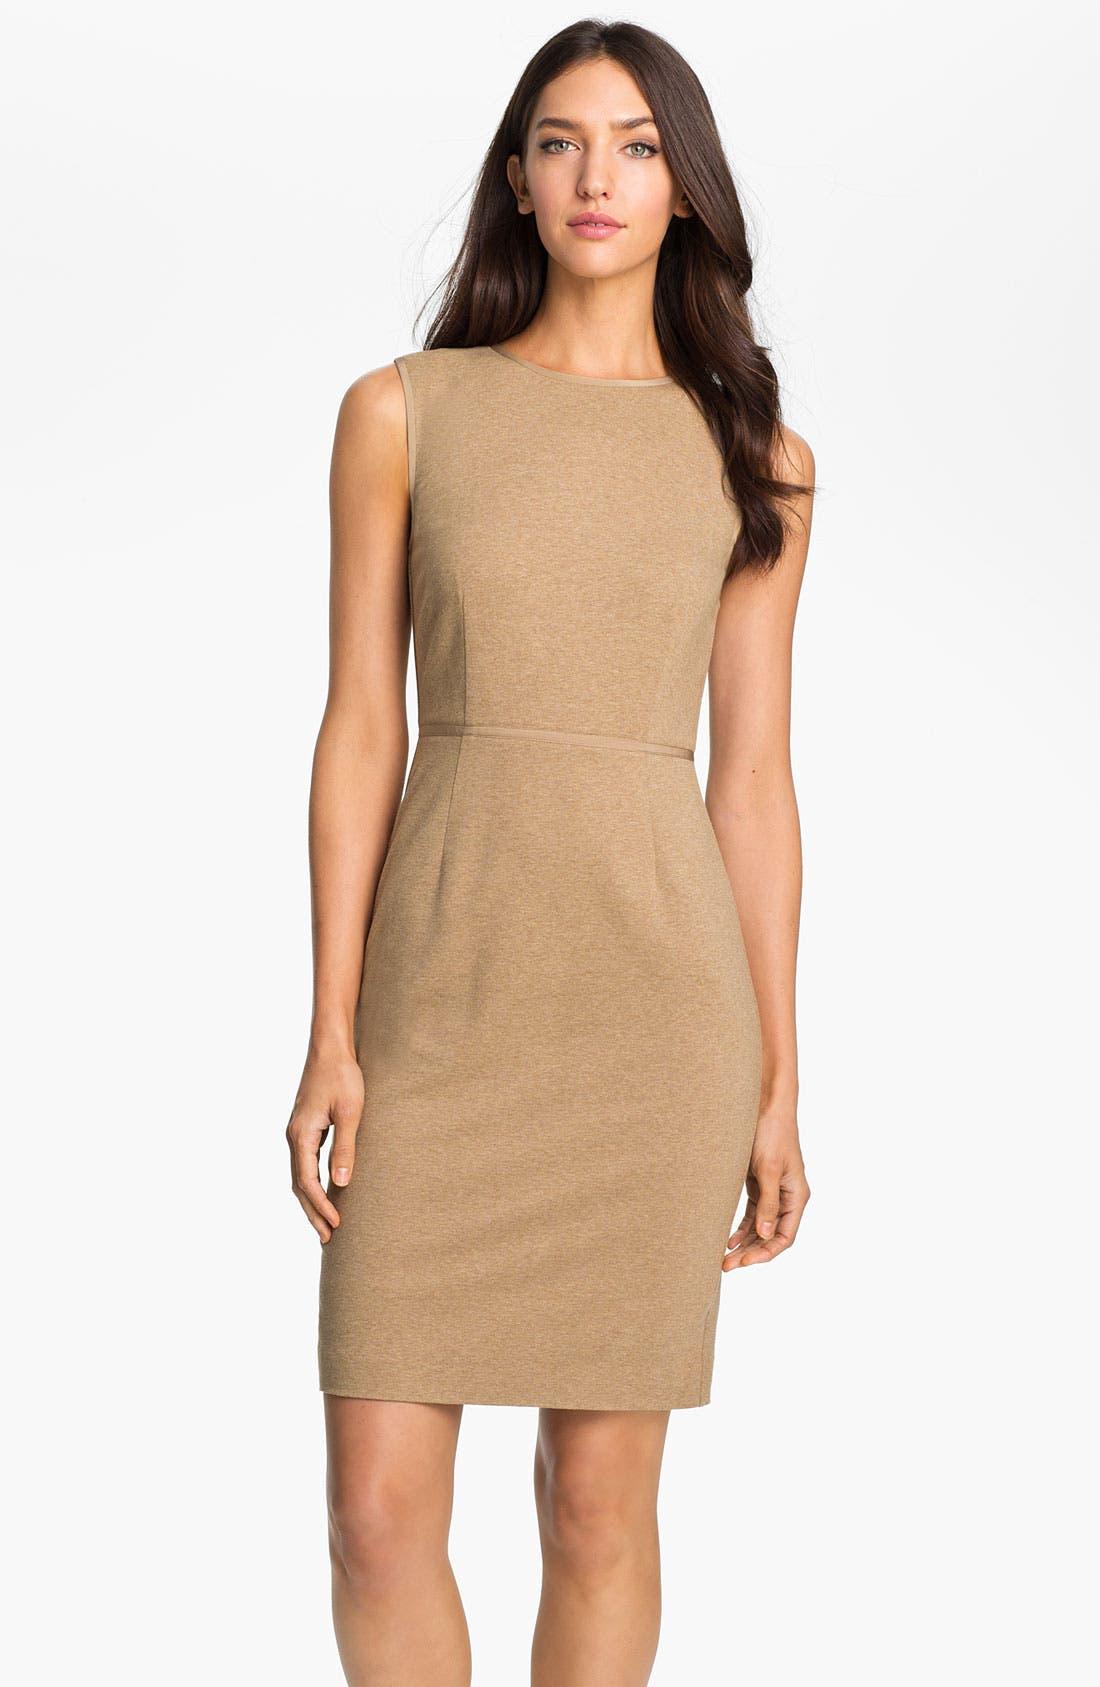 Alternate Image 1 Selected - Trina Turk 'Myrna' Knit Sheath Dress